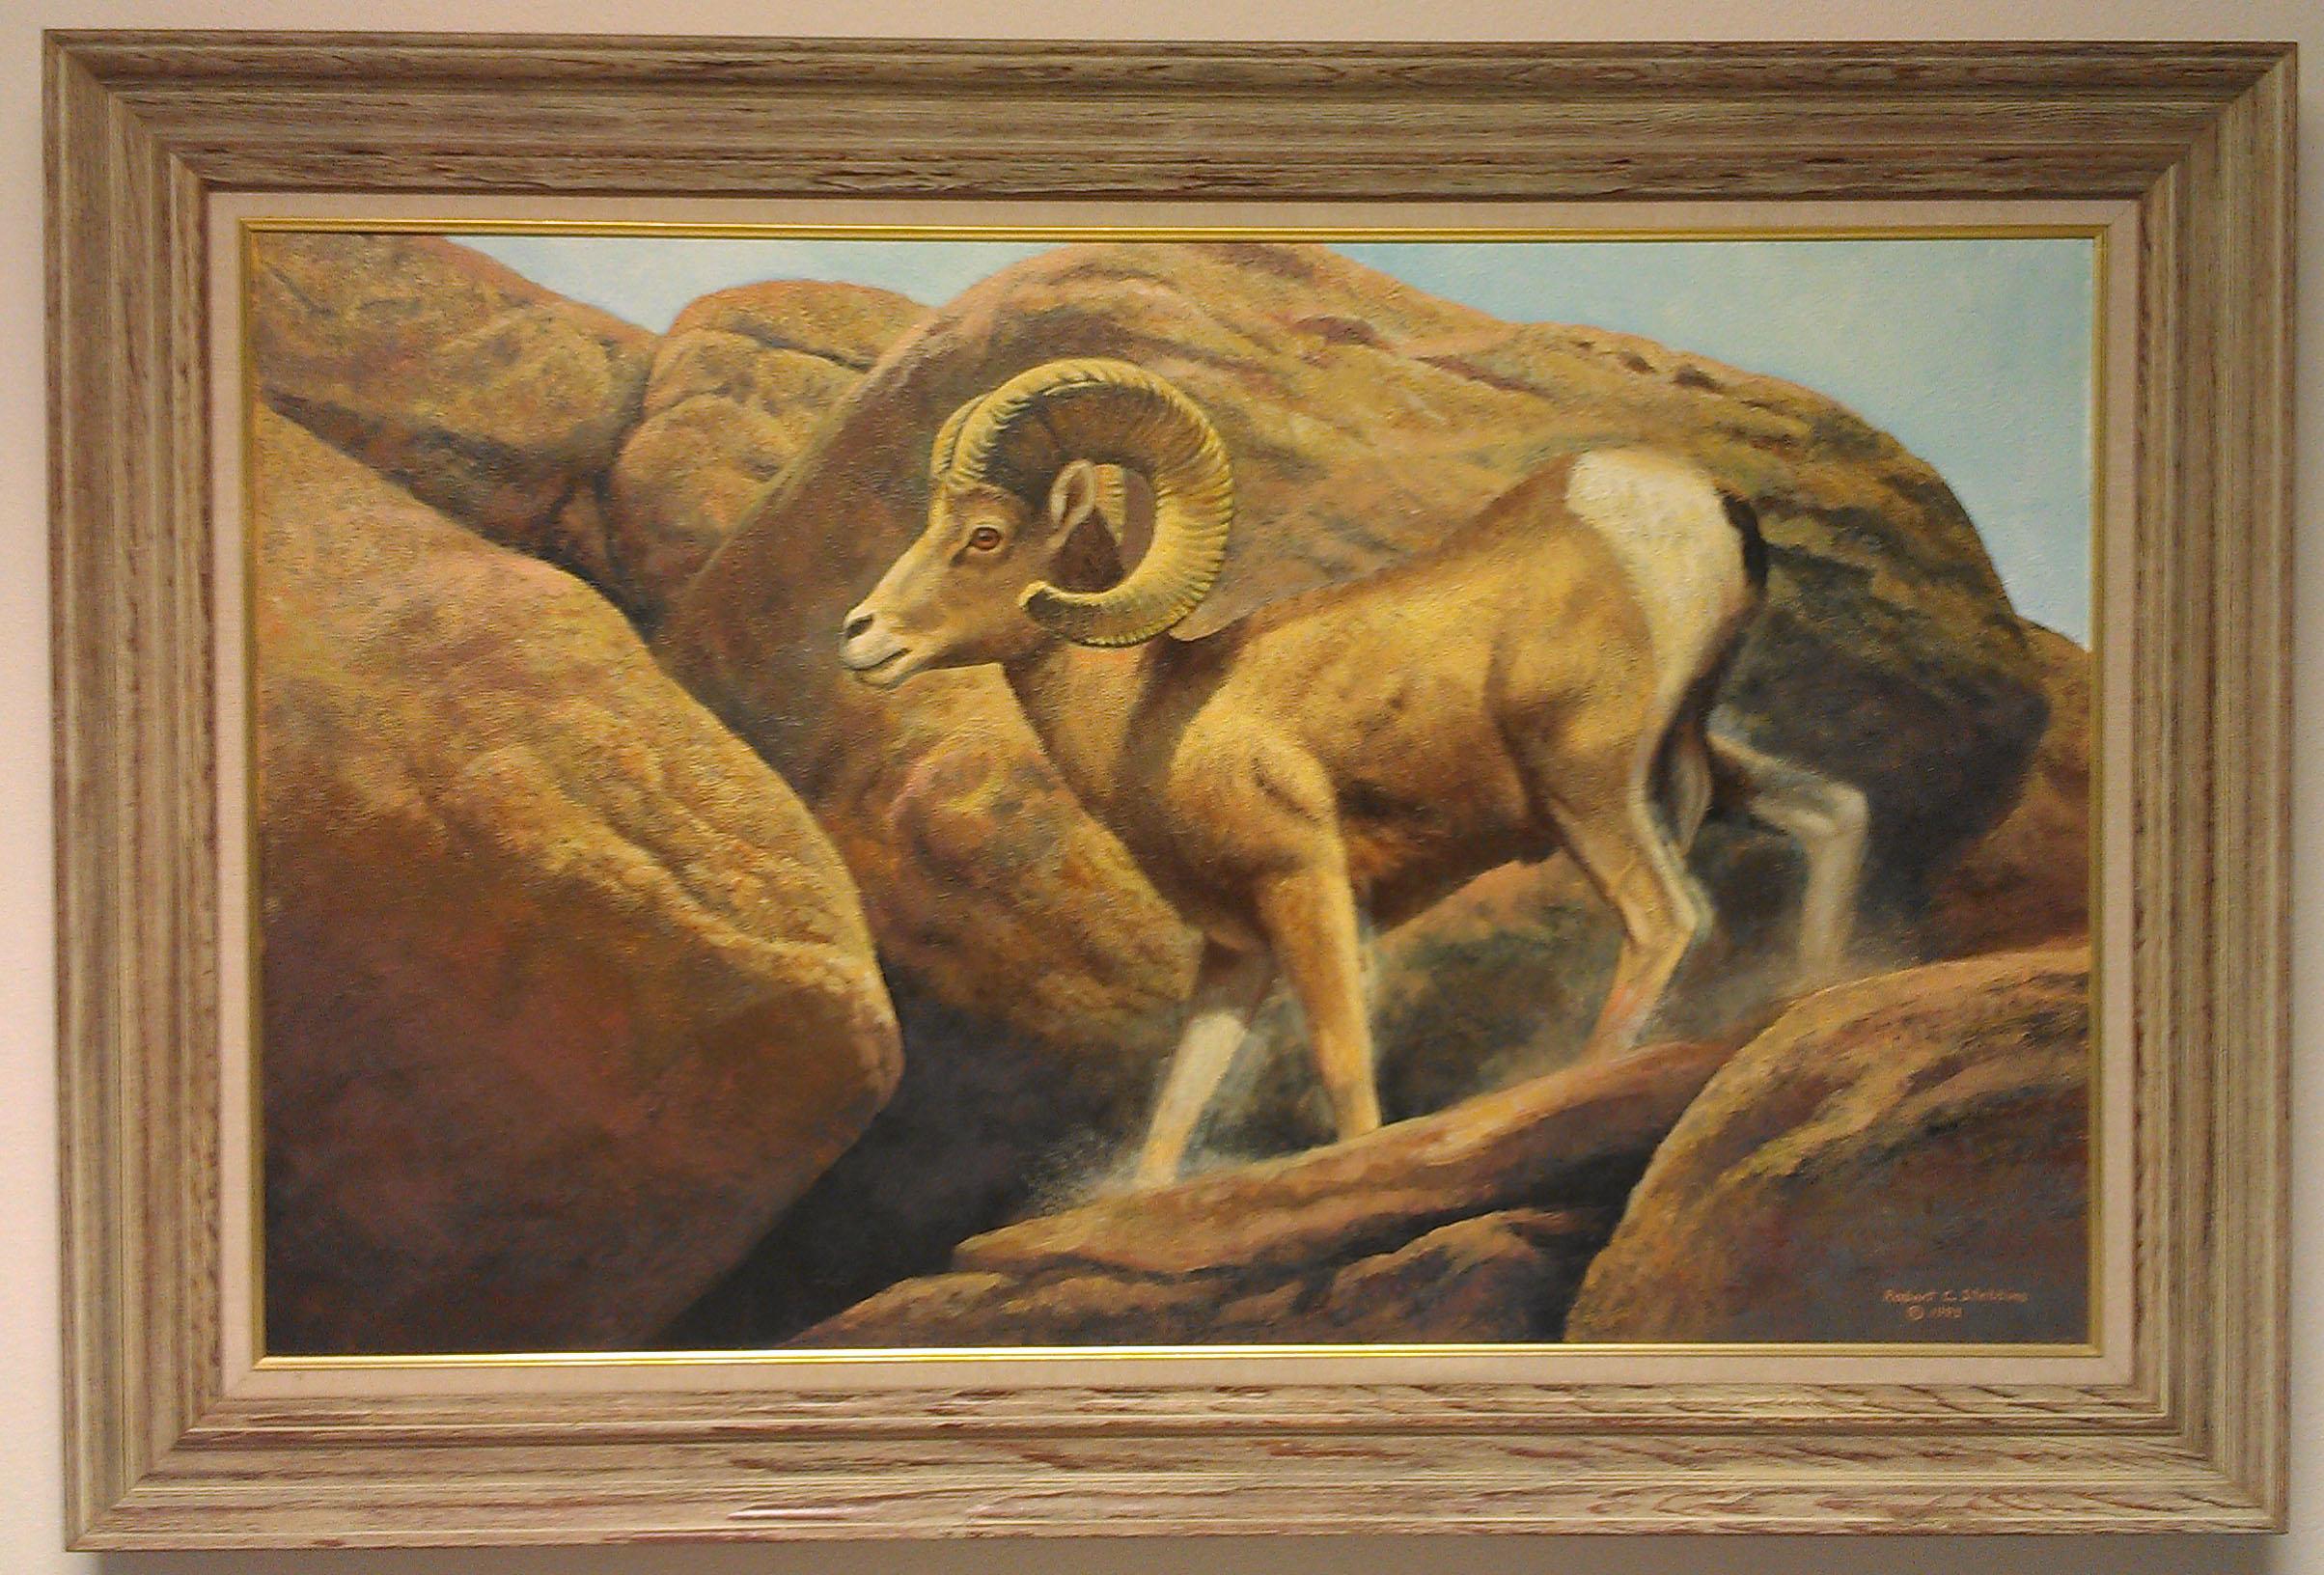 Stebbins oil painting, 1993